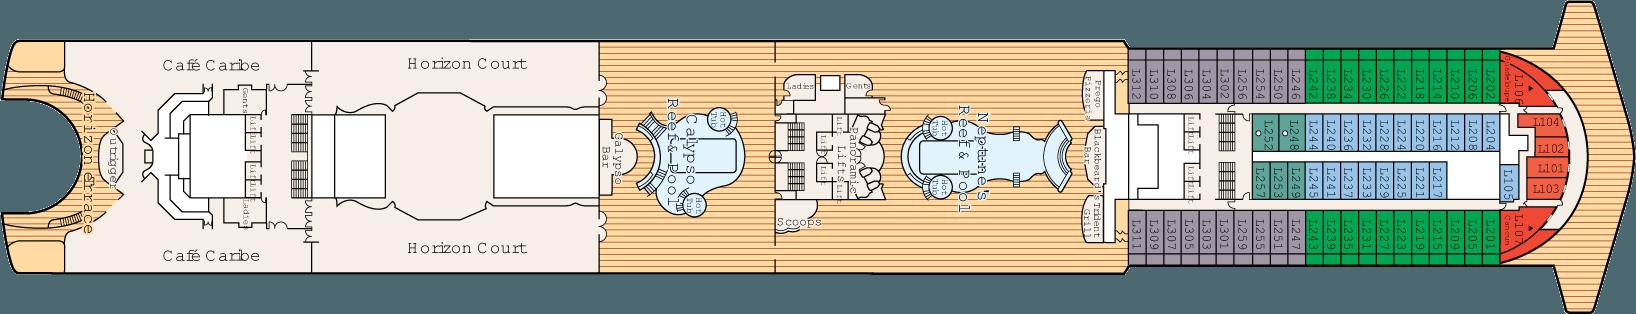 Deck 15